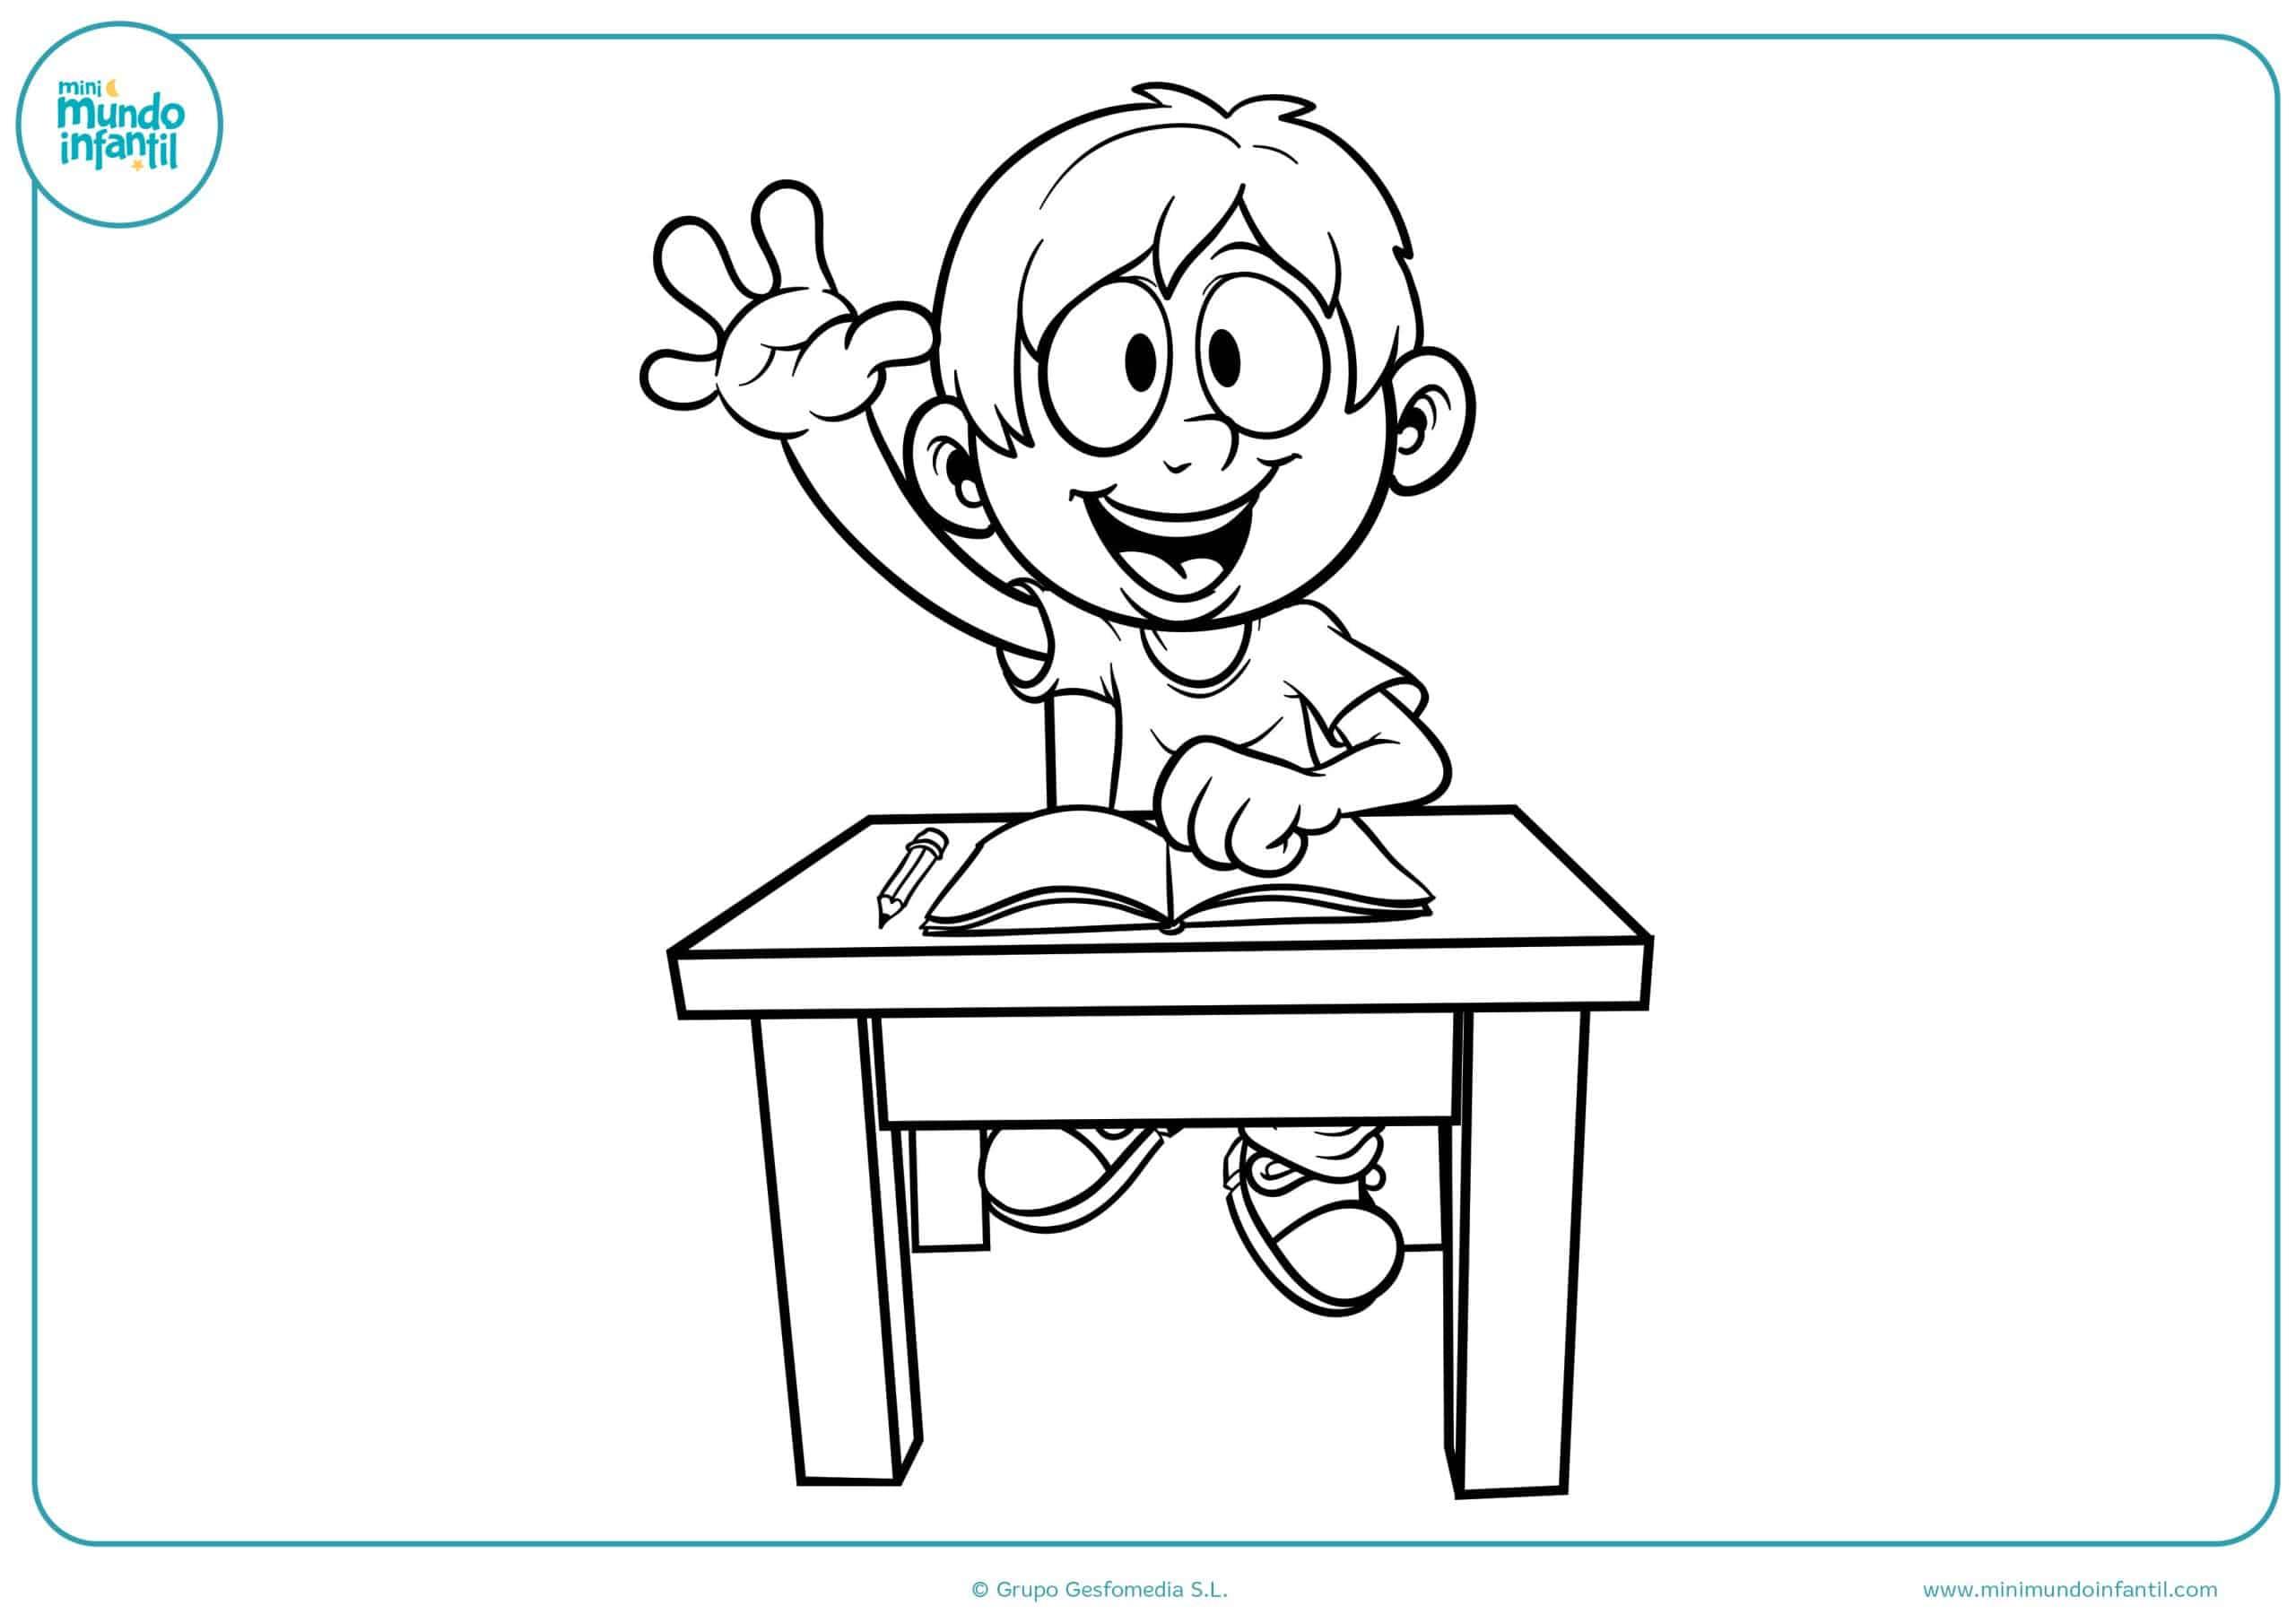 2-Dibujos colorear regreso a clases